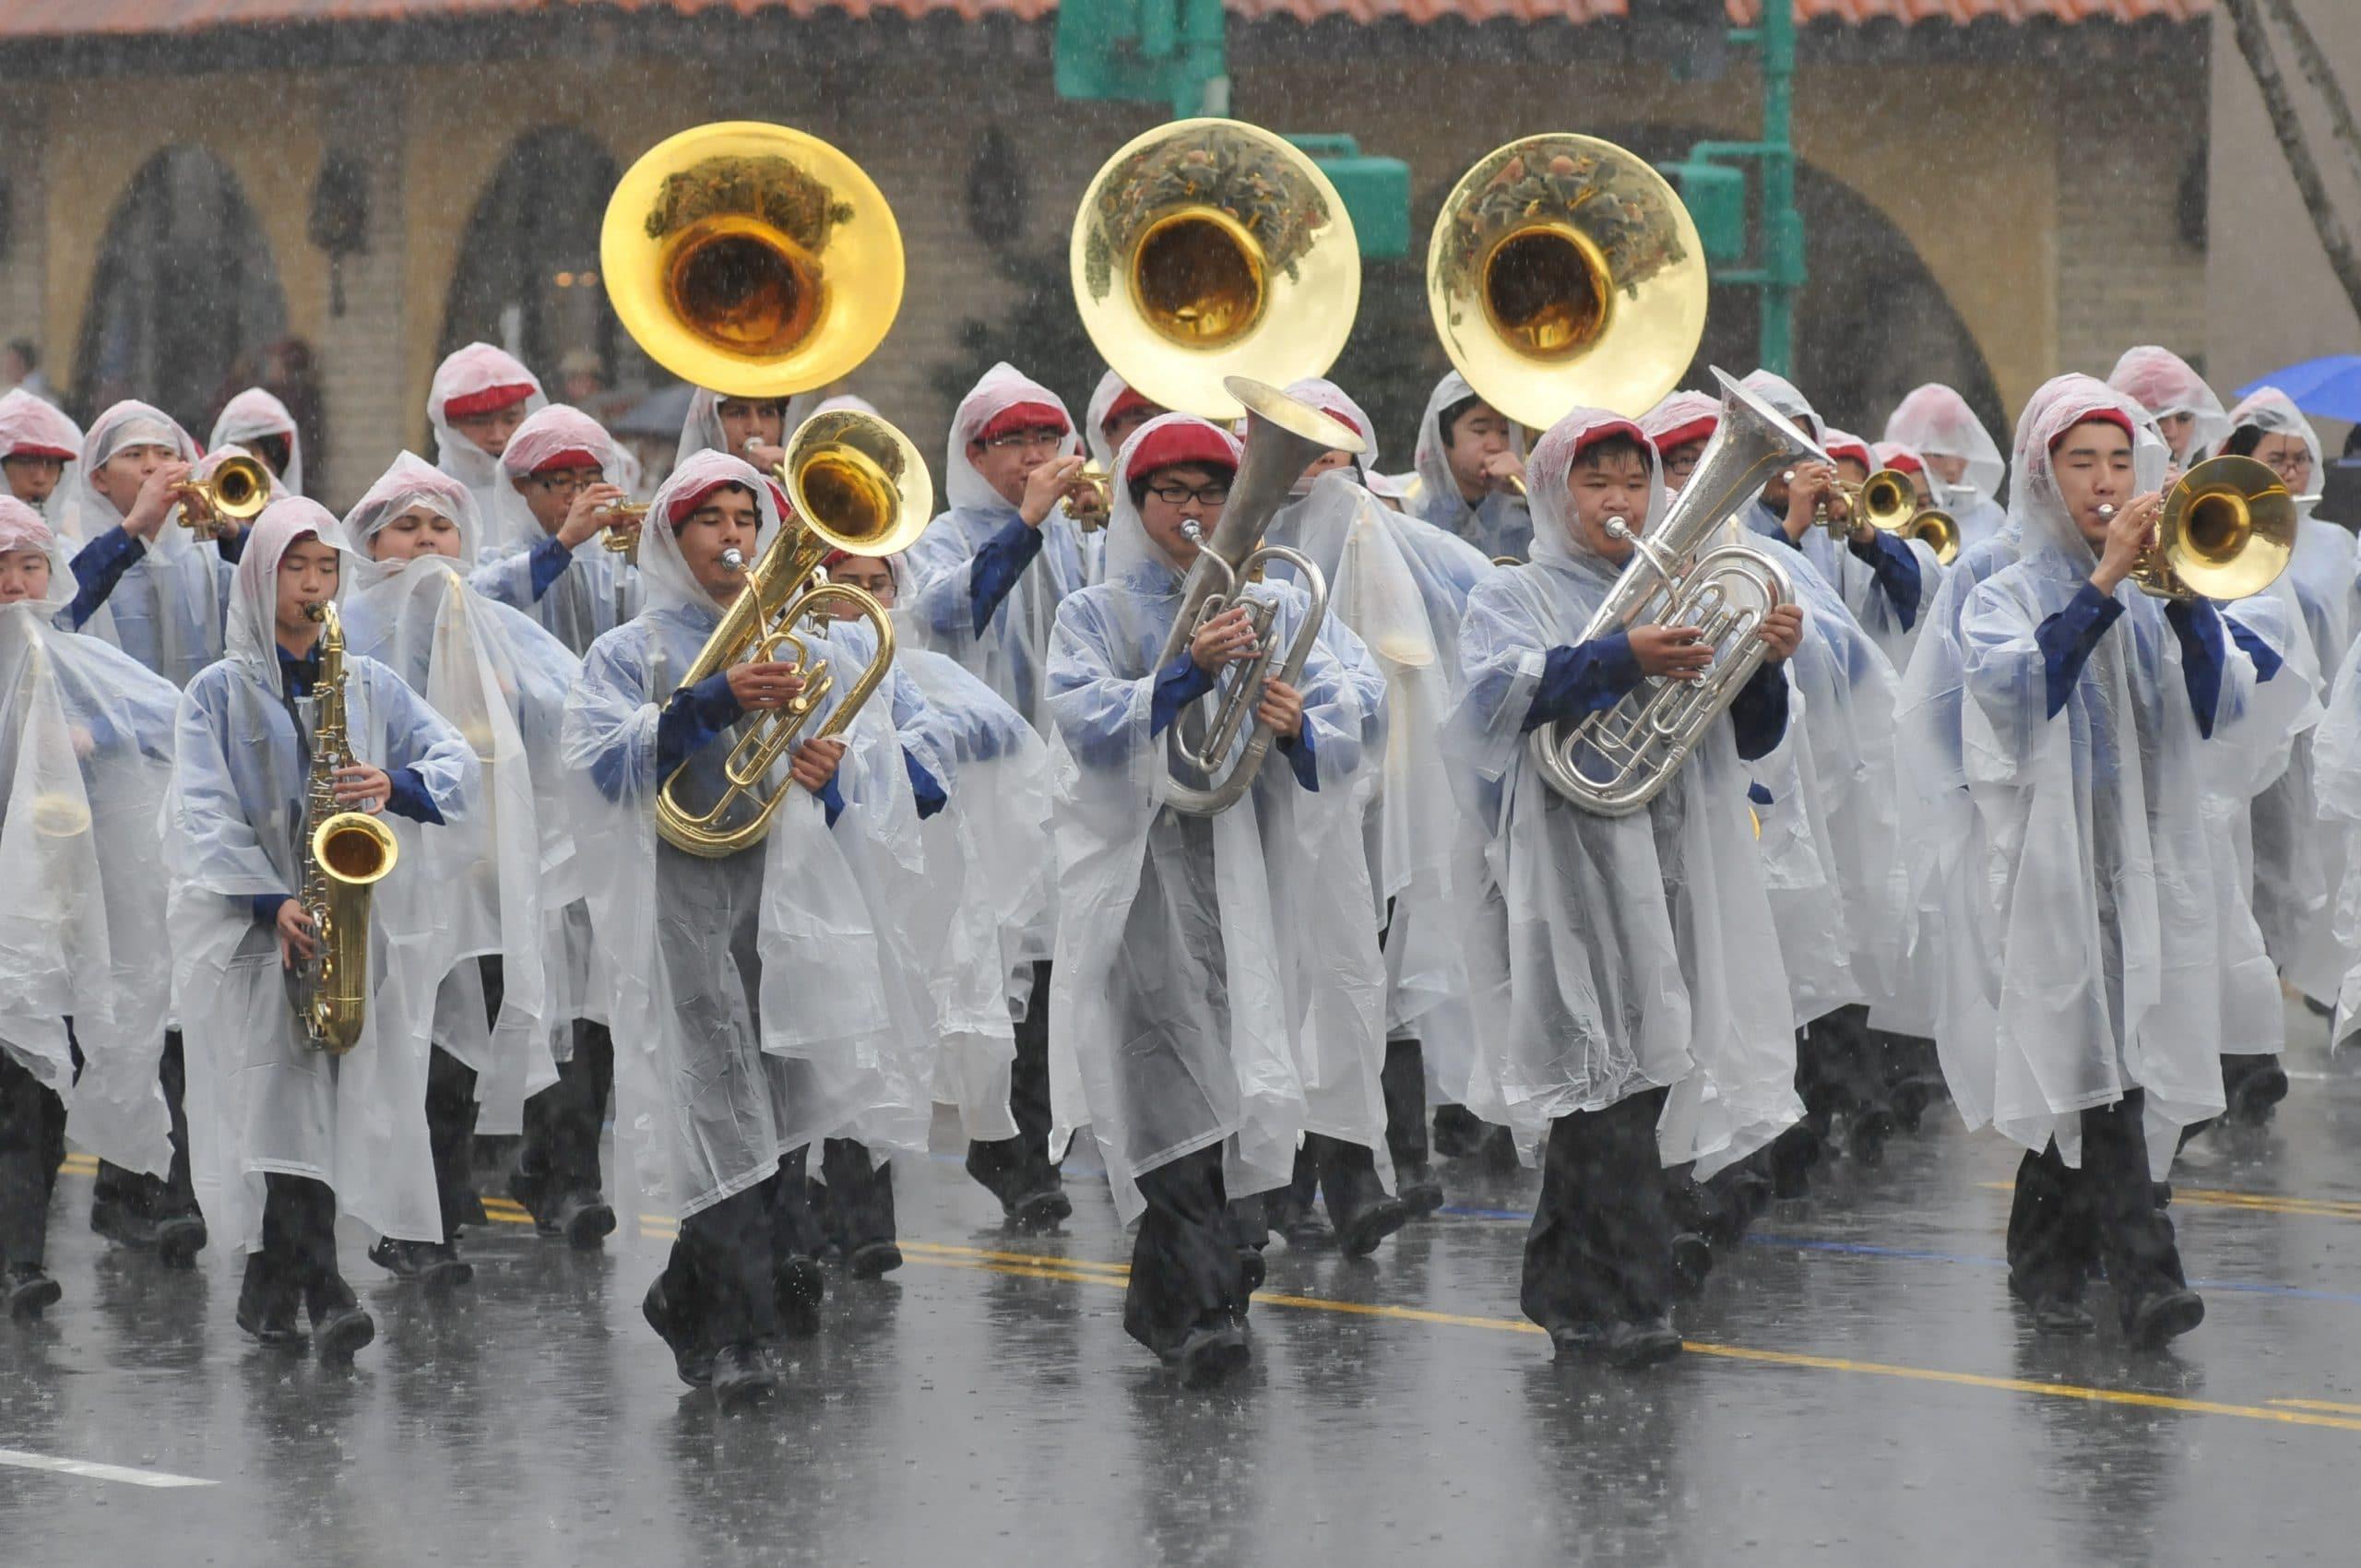 Rain-on-the-Parade-2010.jpg